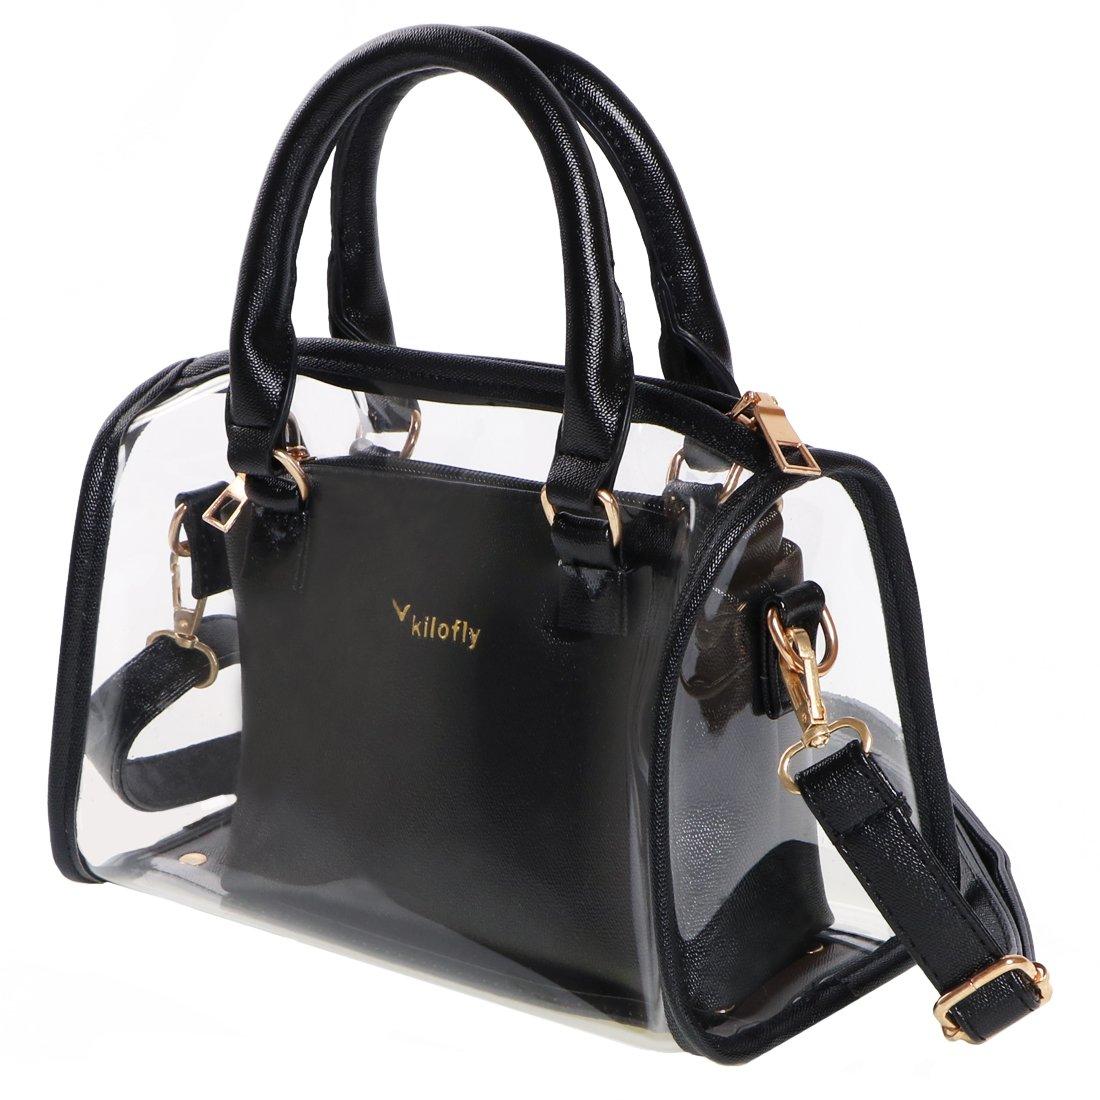 kilofly Women's 2-in-1 Clear Transparent Handbag Crossbody Purse Shoulder Bag